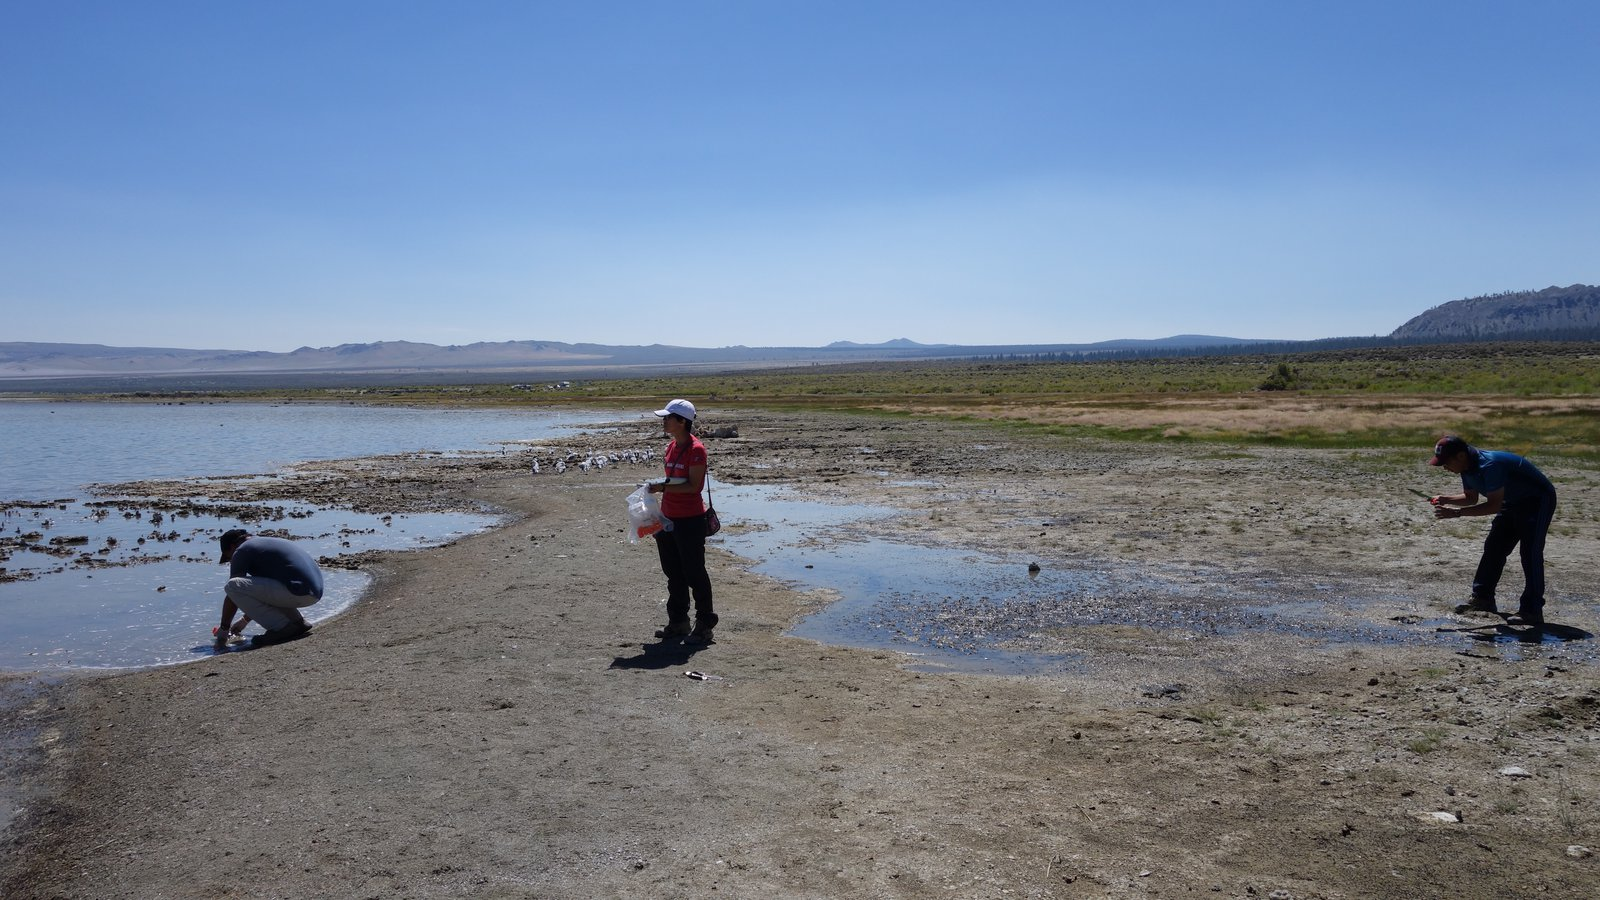 Researchers working at Mono Lake